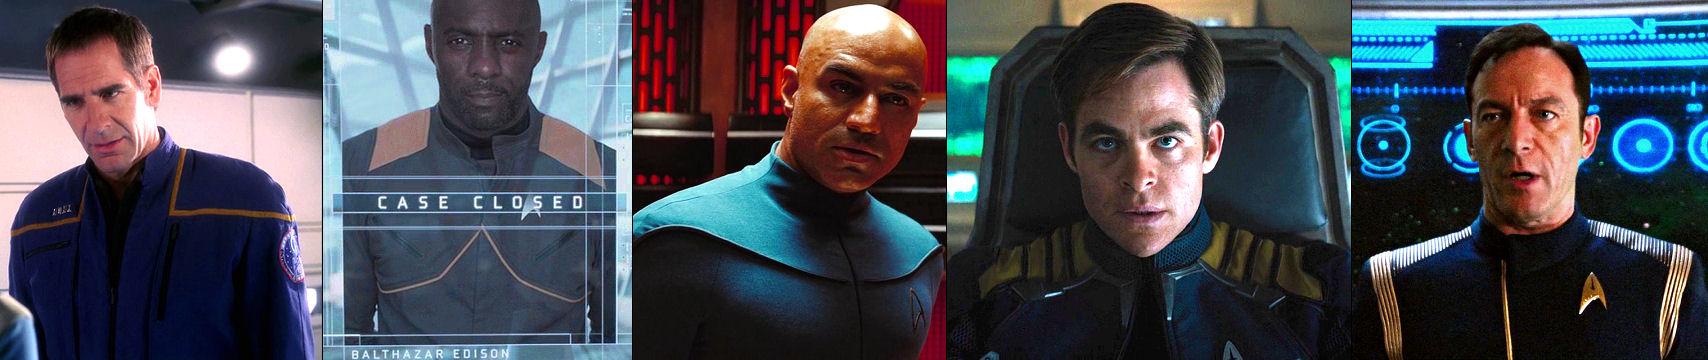 Blue uniforms in Star Trek